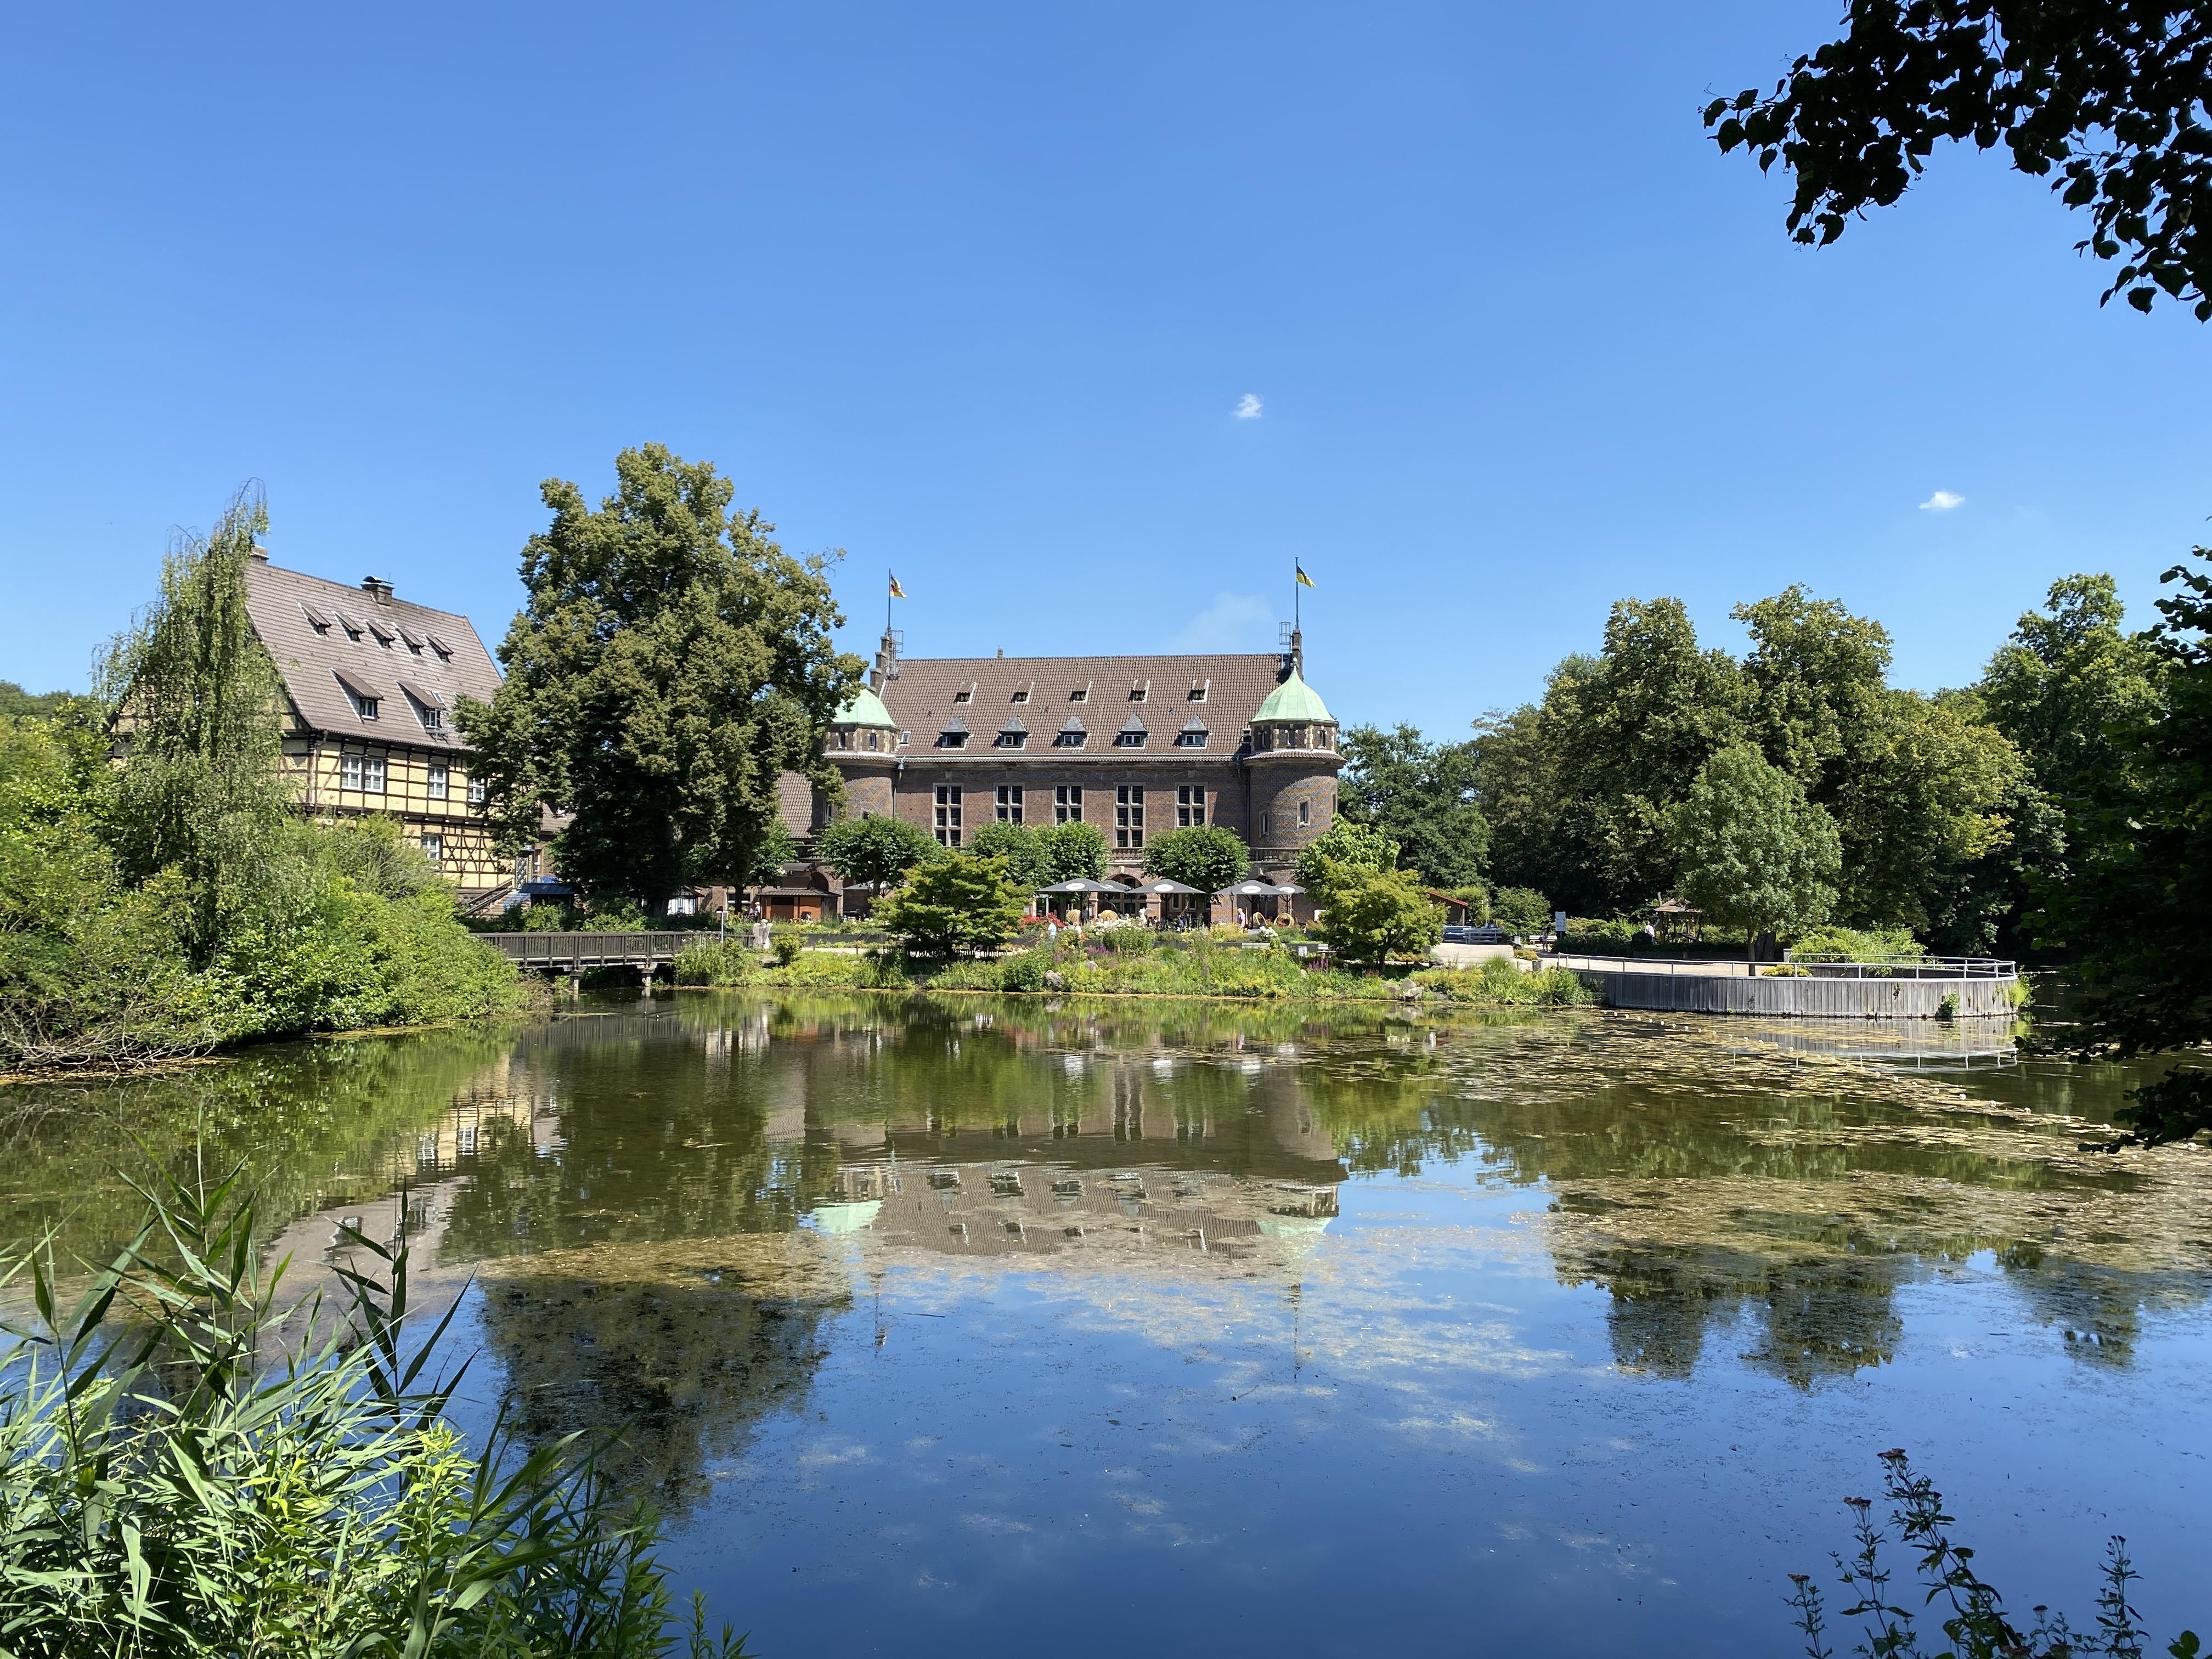 Ausflugtipp: Wasserschloss Haus Wittringen